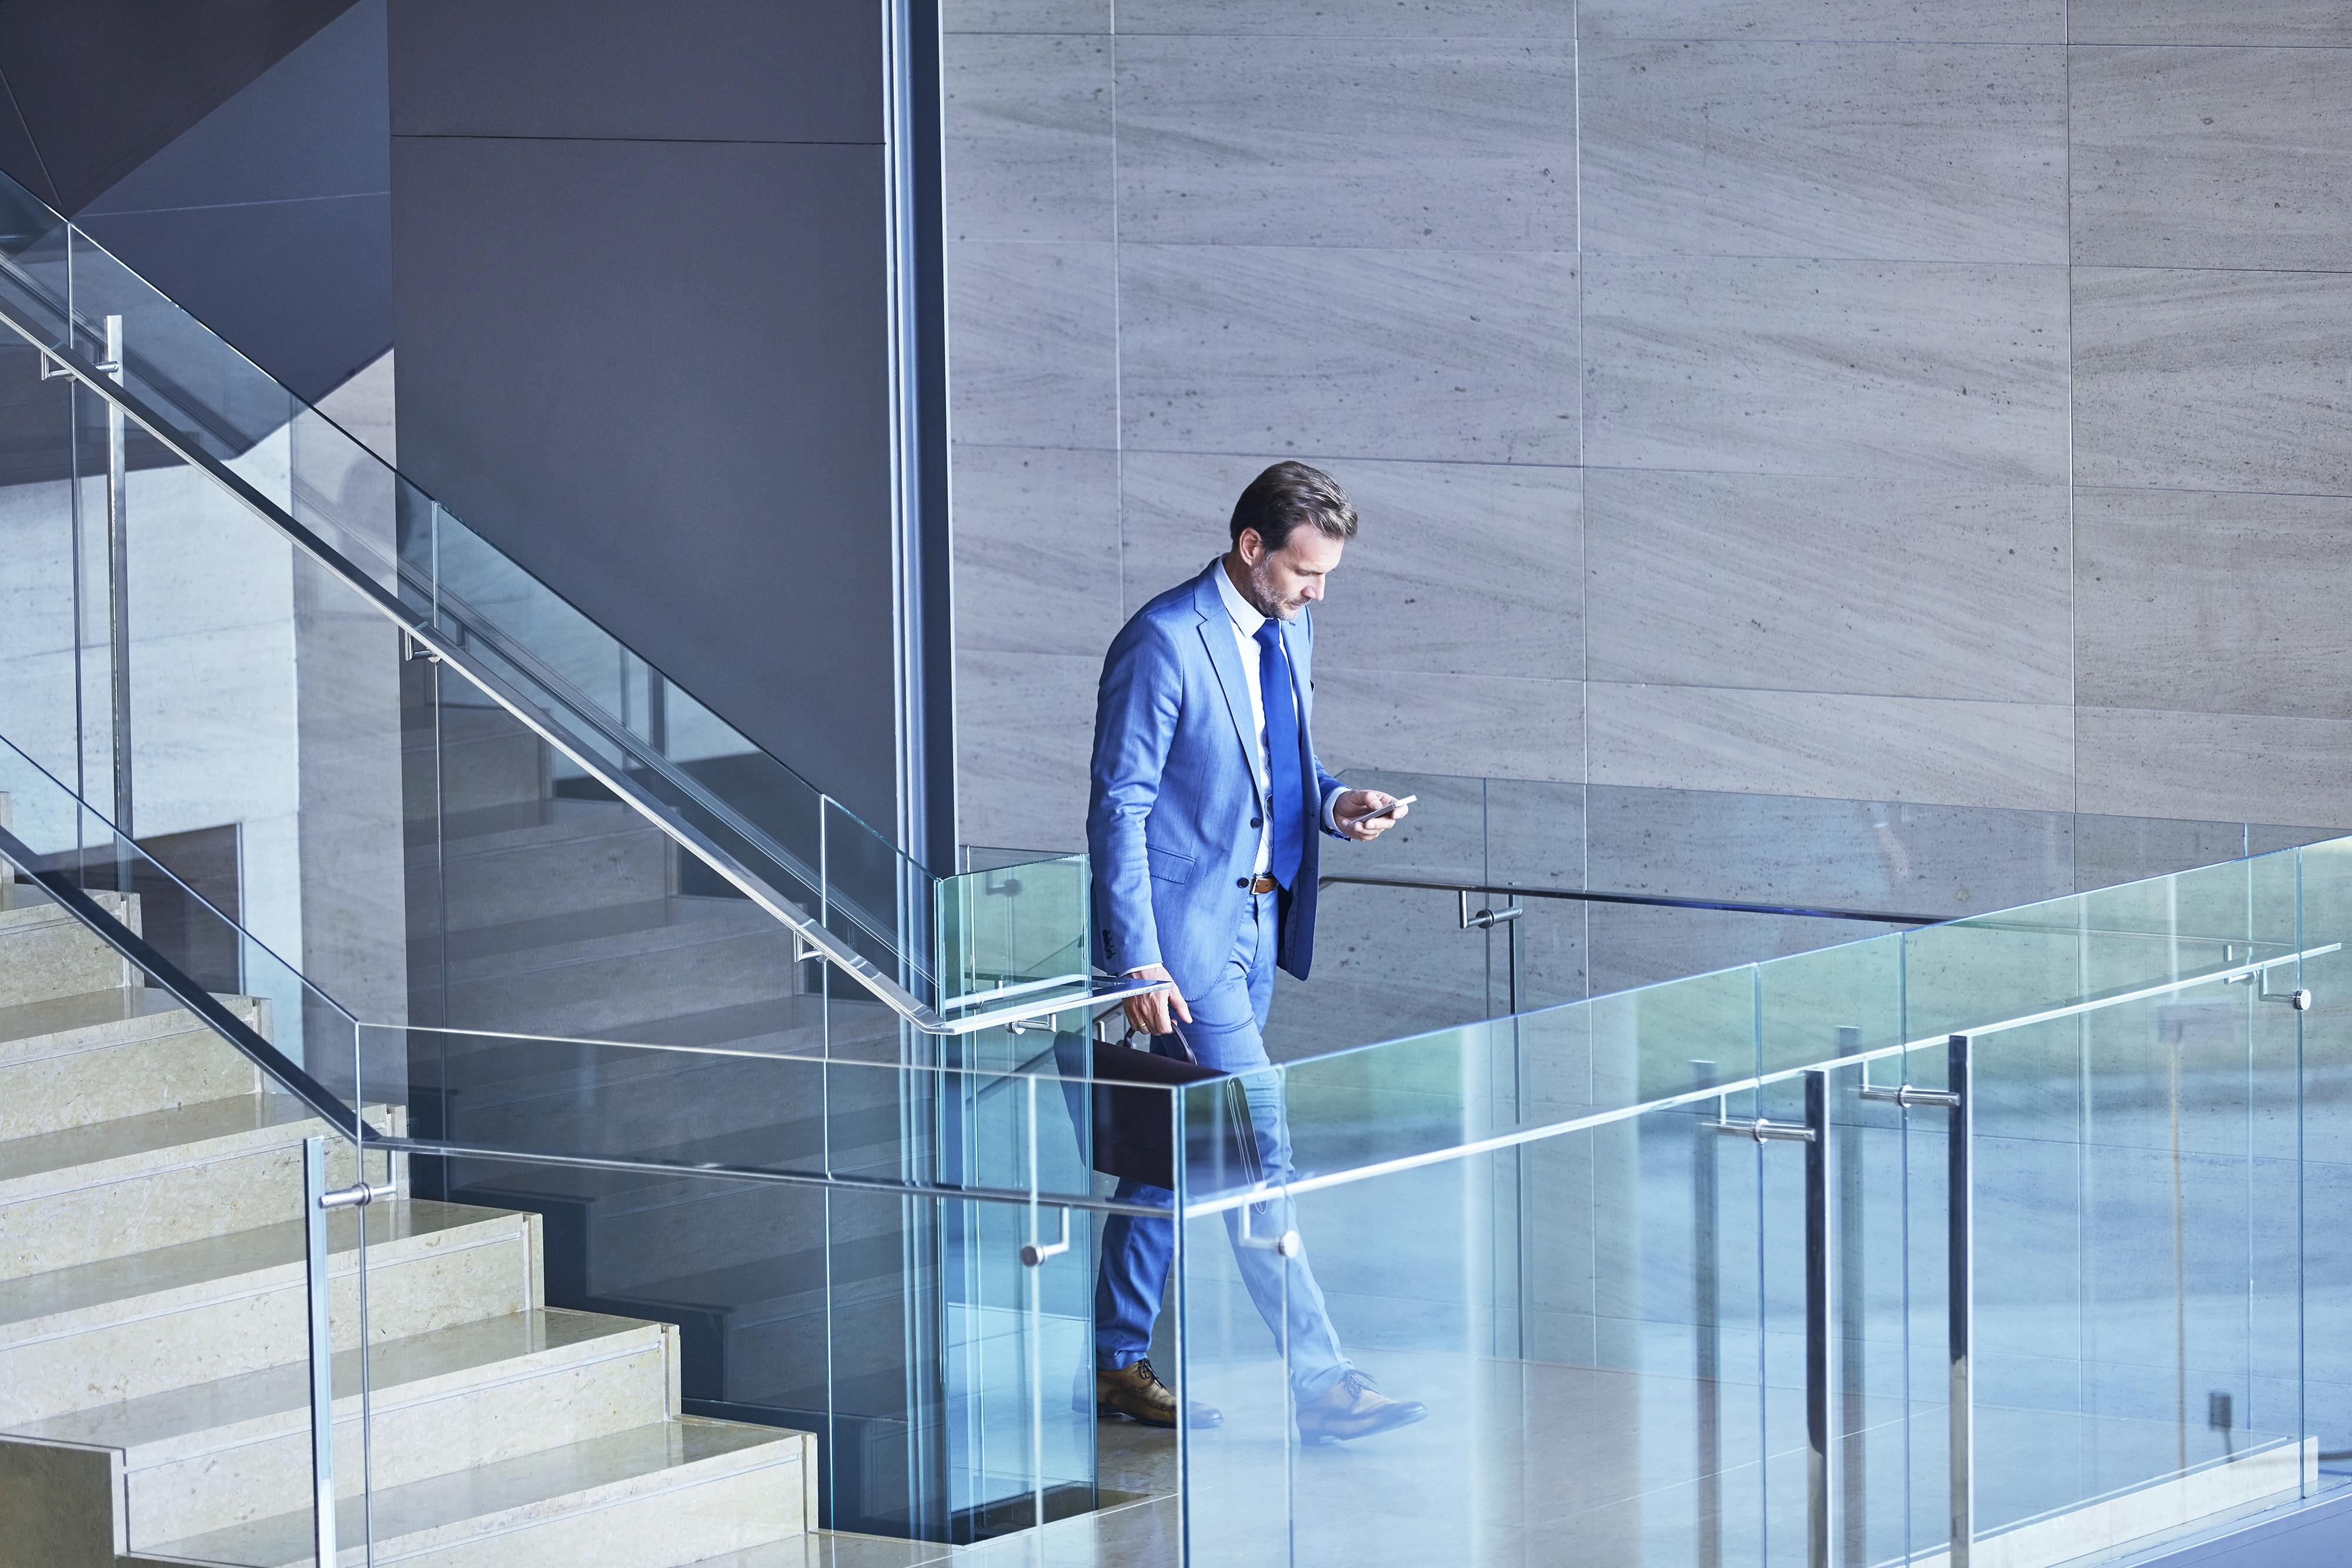 JW_man_blue_suit_walking_phone_RGB_150